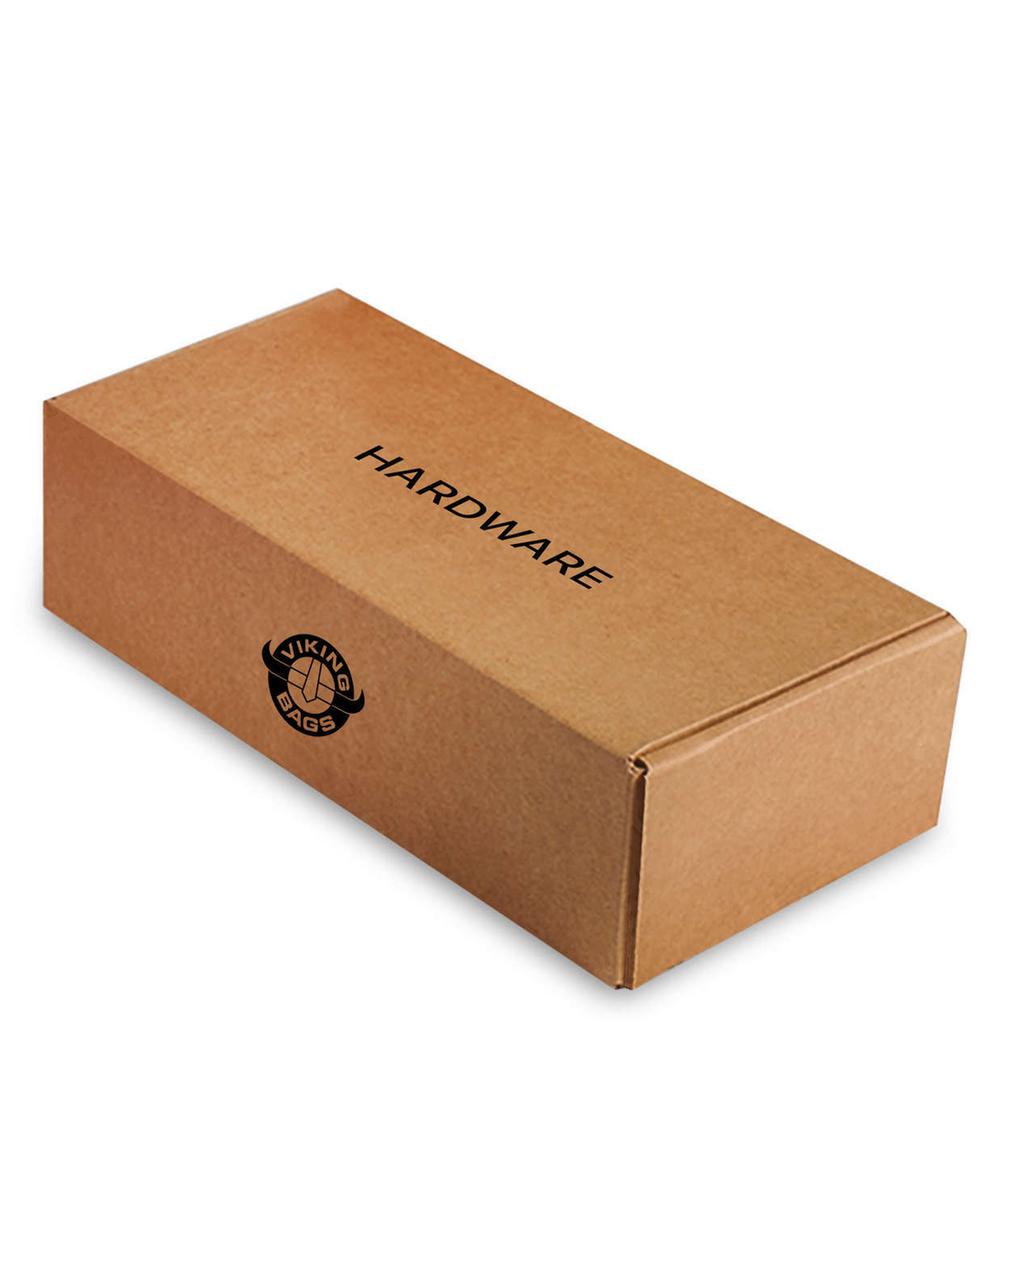 Viking Specific Studded Saddlebags For Harley Softail Street Bob Hardware Box